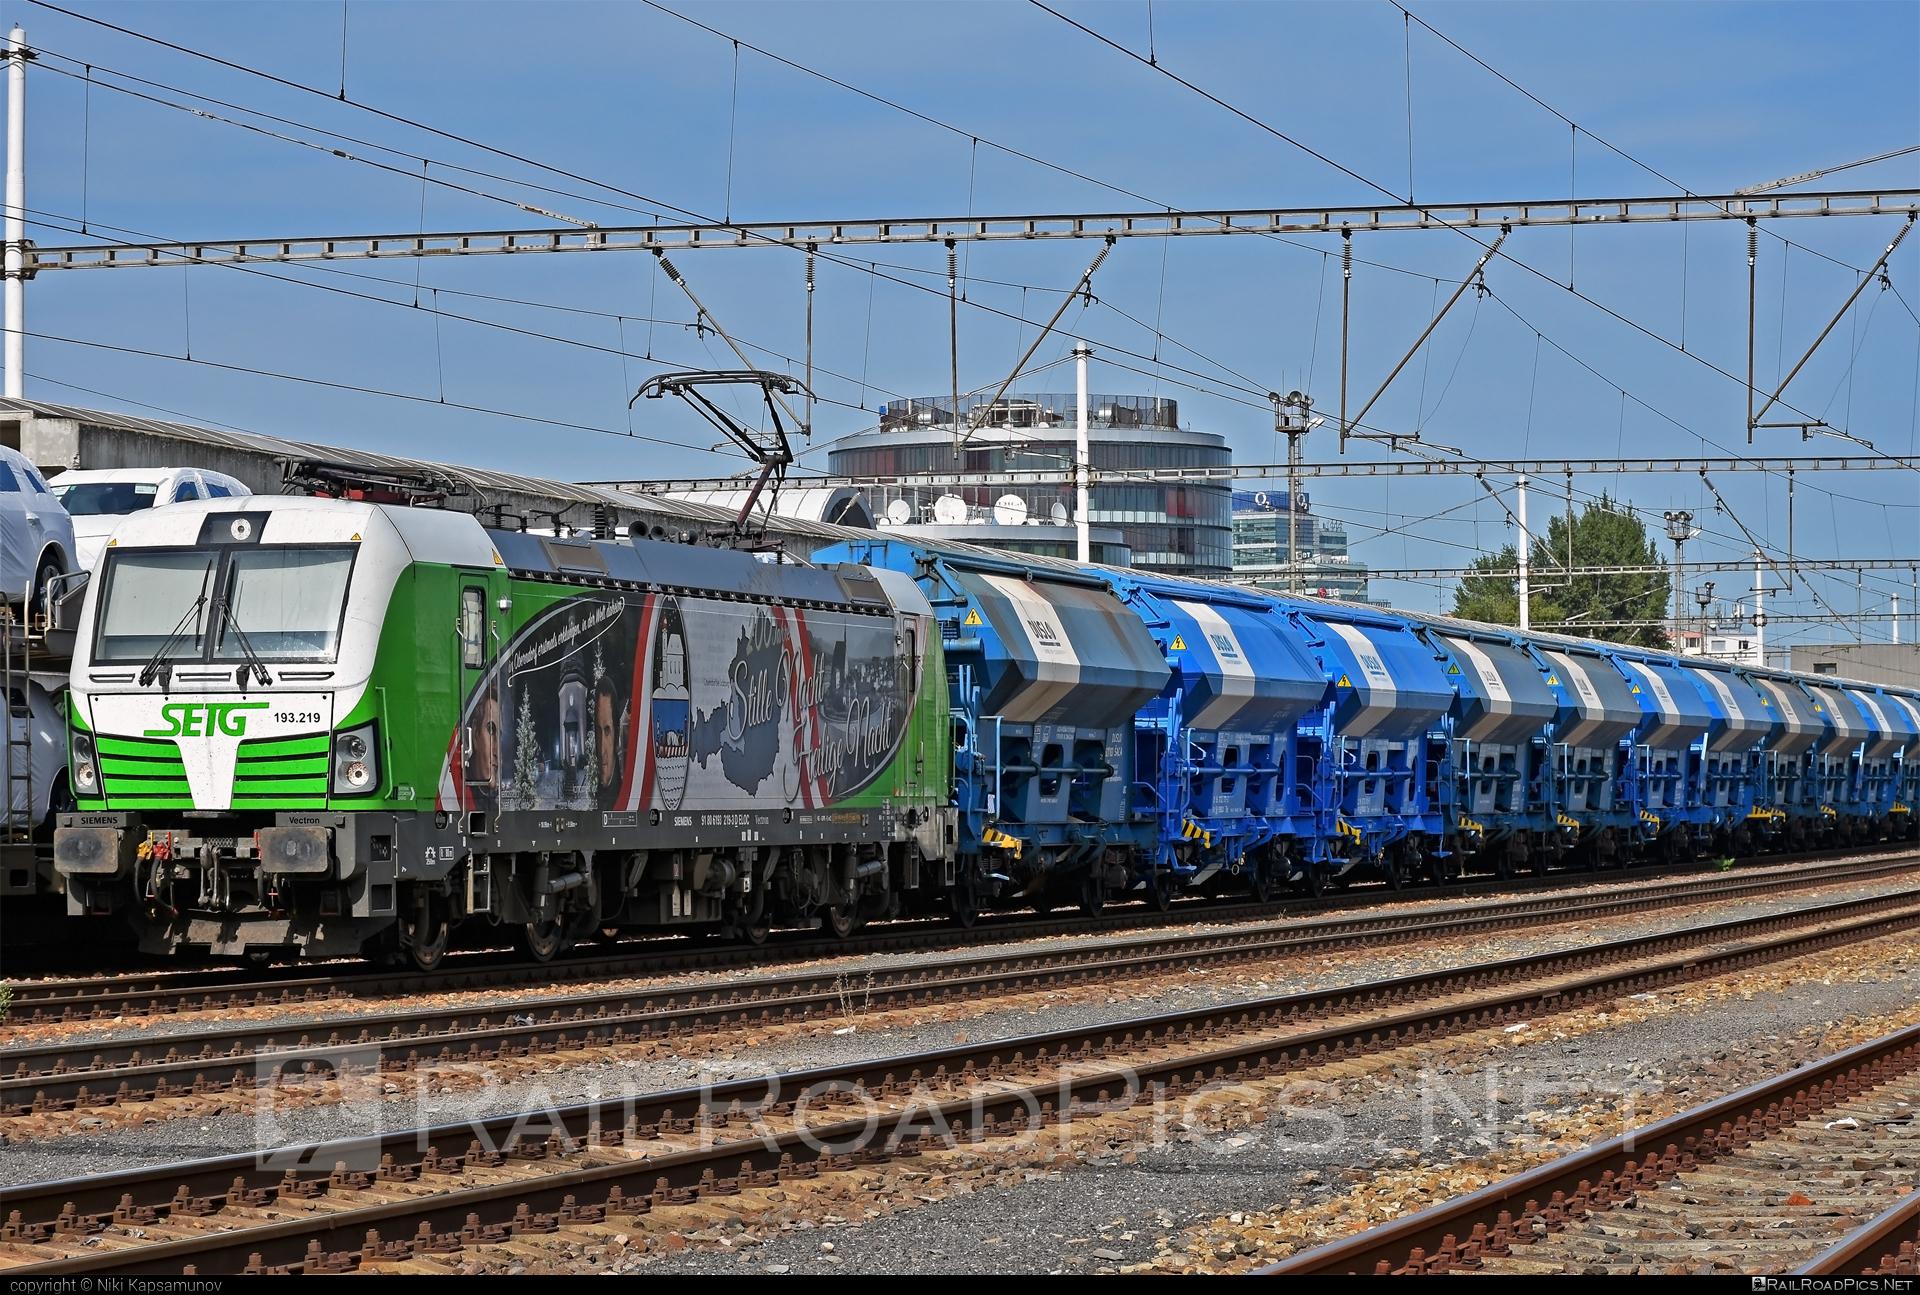 Siemens Vectron AC - 193 219 operated by Salzburger Eisenbahn Transportlogistik GmbH #SalzburgerEisenbahnTransportlogistik #SalzburgerEisenbahnTransportlogistikGmbH #duslo #ell #ellgermany #eloc #europeanlocomotiveleasing #hopperwagon #setg #siemens #siemensvectron #siemensvectronac #vectron #vectronac